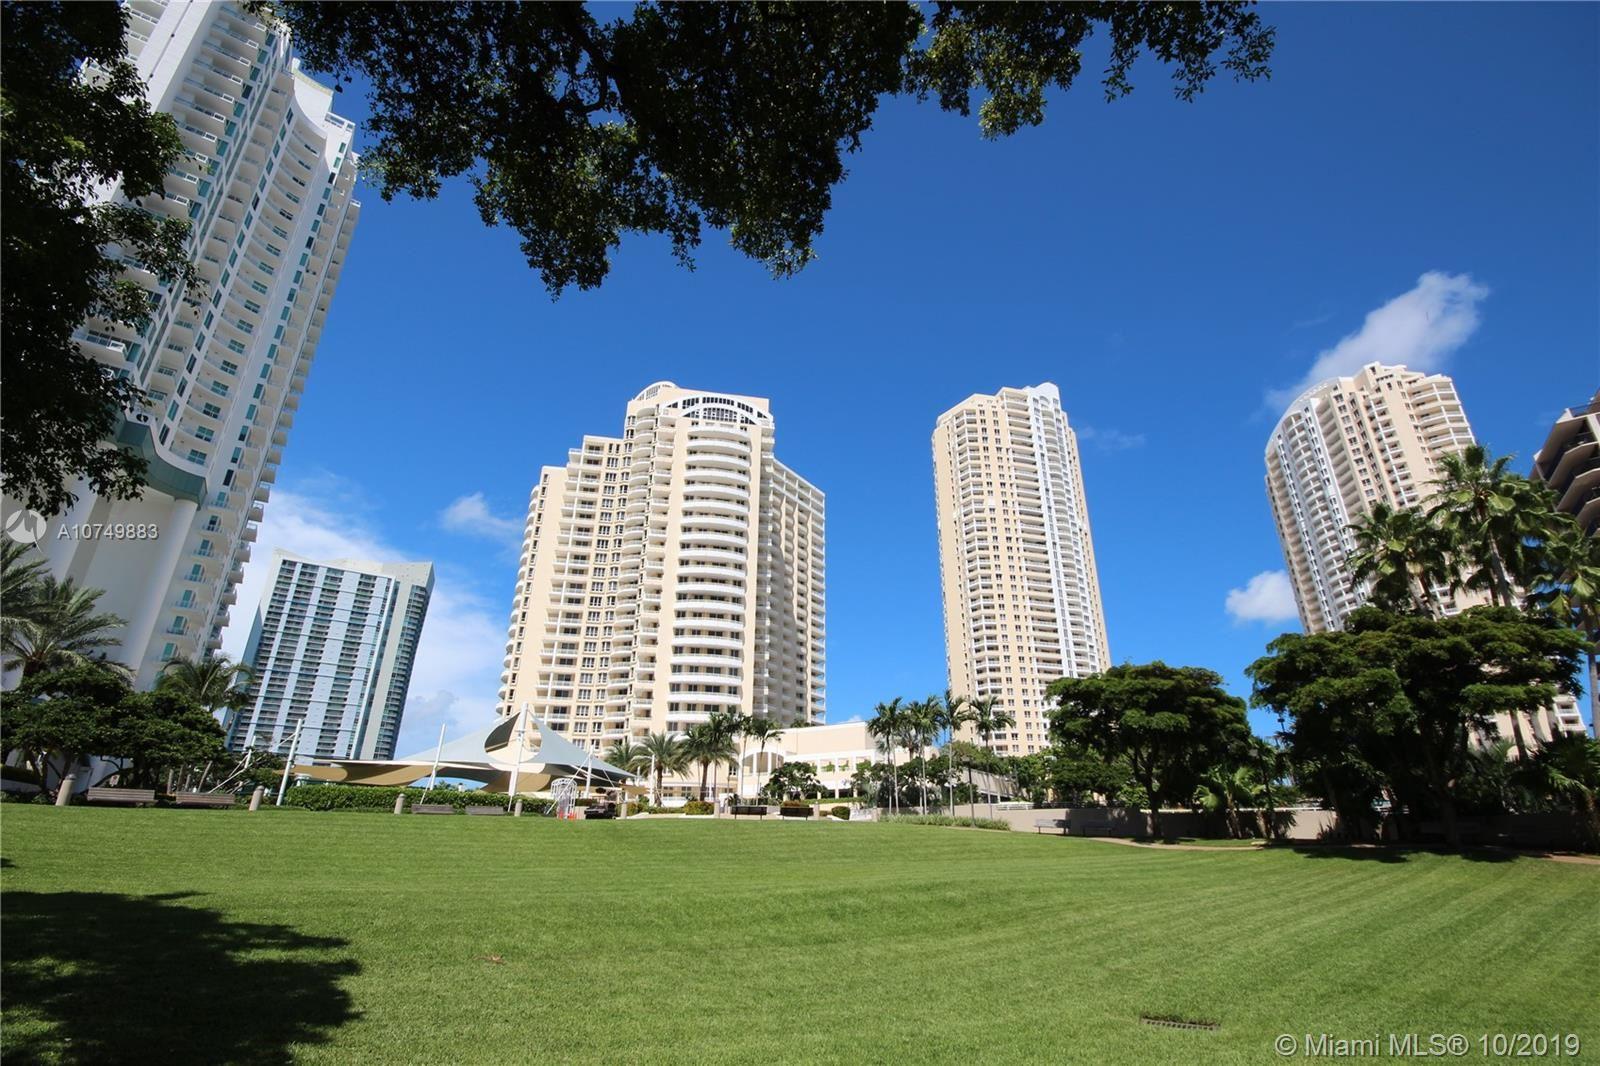 888 Brickell Key Dr #1400, Miami, FL 33131 - #: A10749883